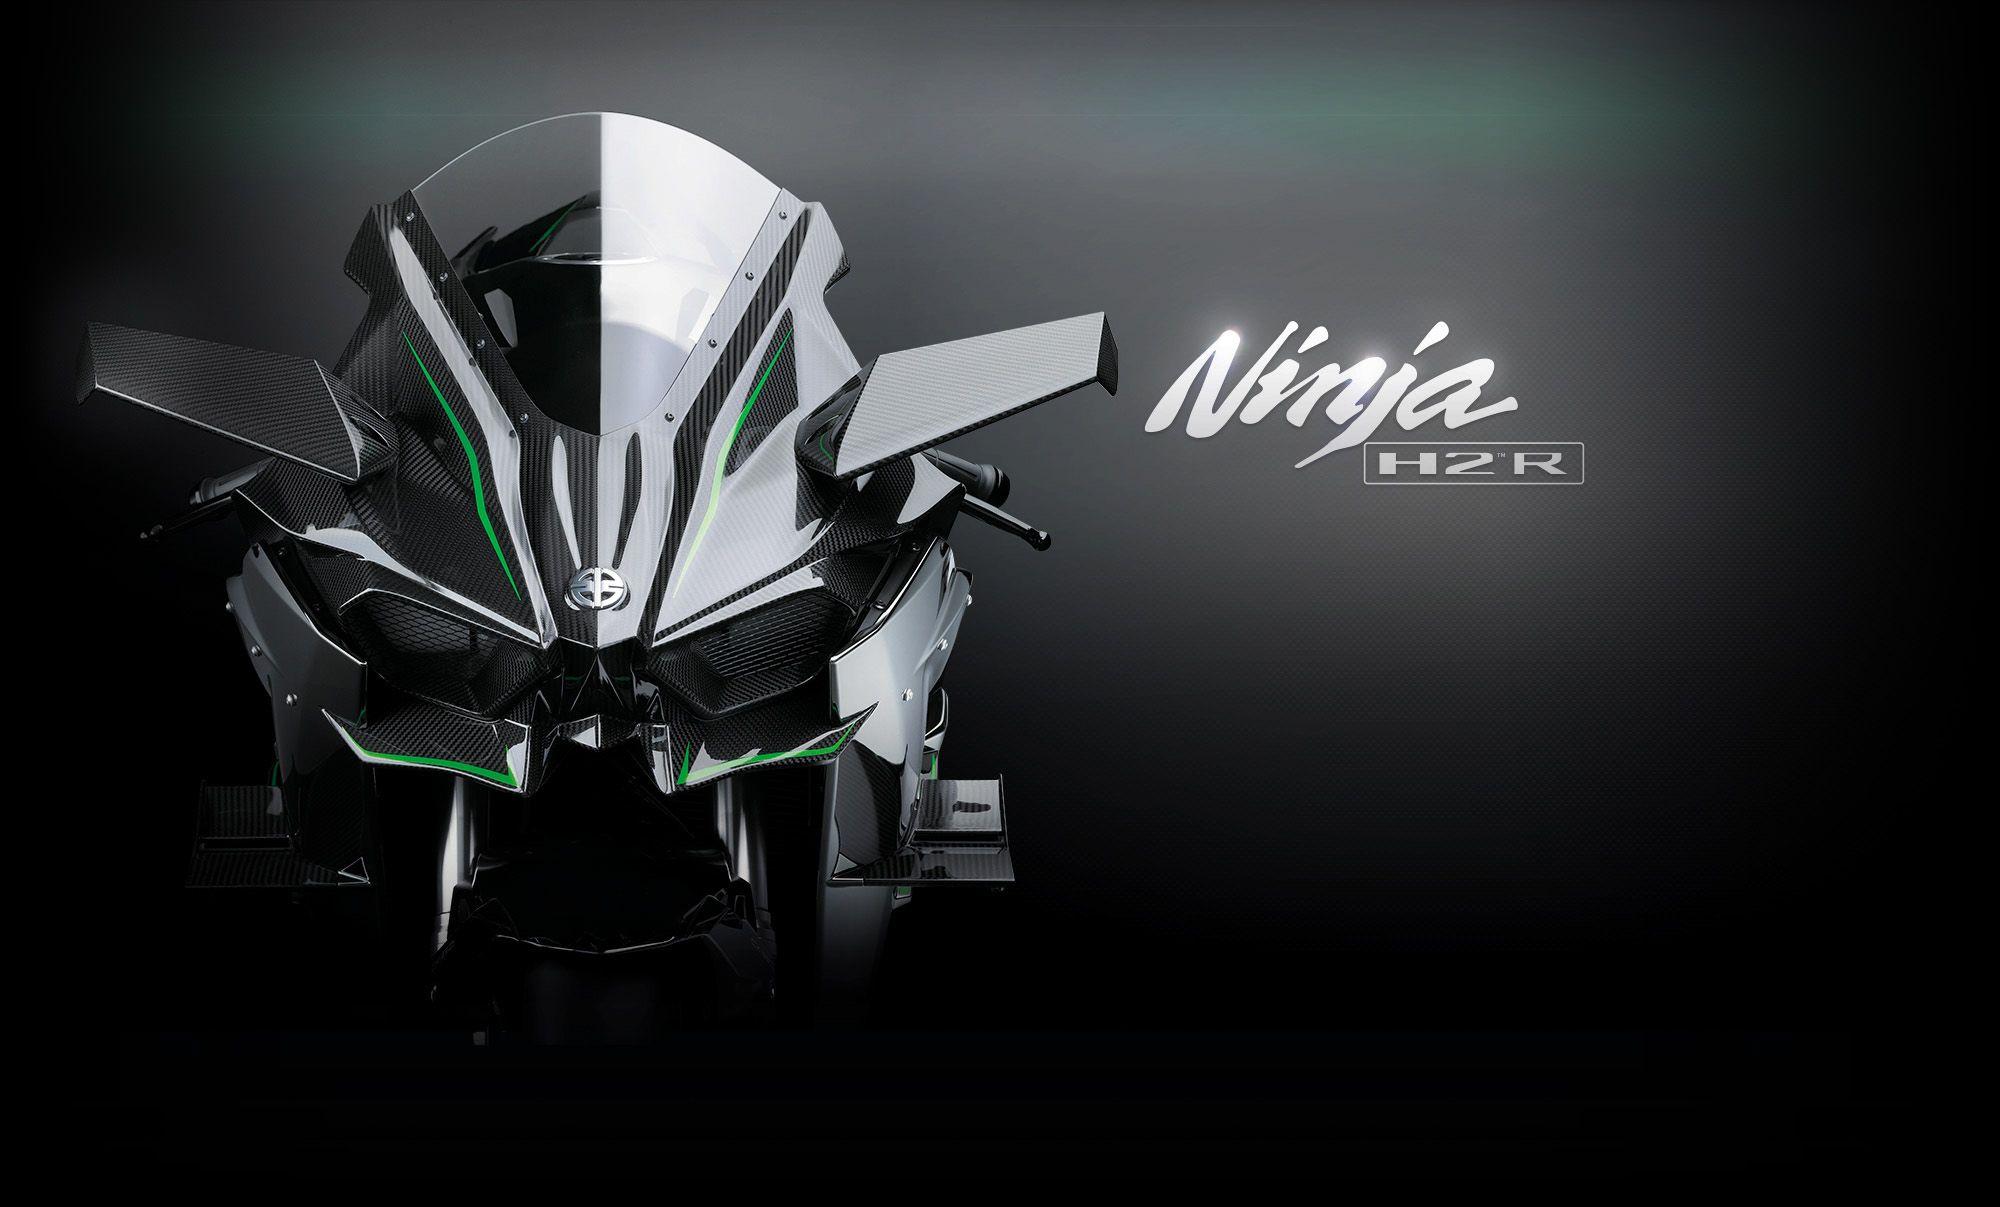 300hp Kawasaki Ninja H2r มอเตอร ไซค มอเตอร ไซค แต ง